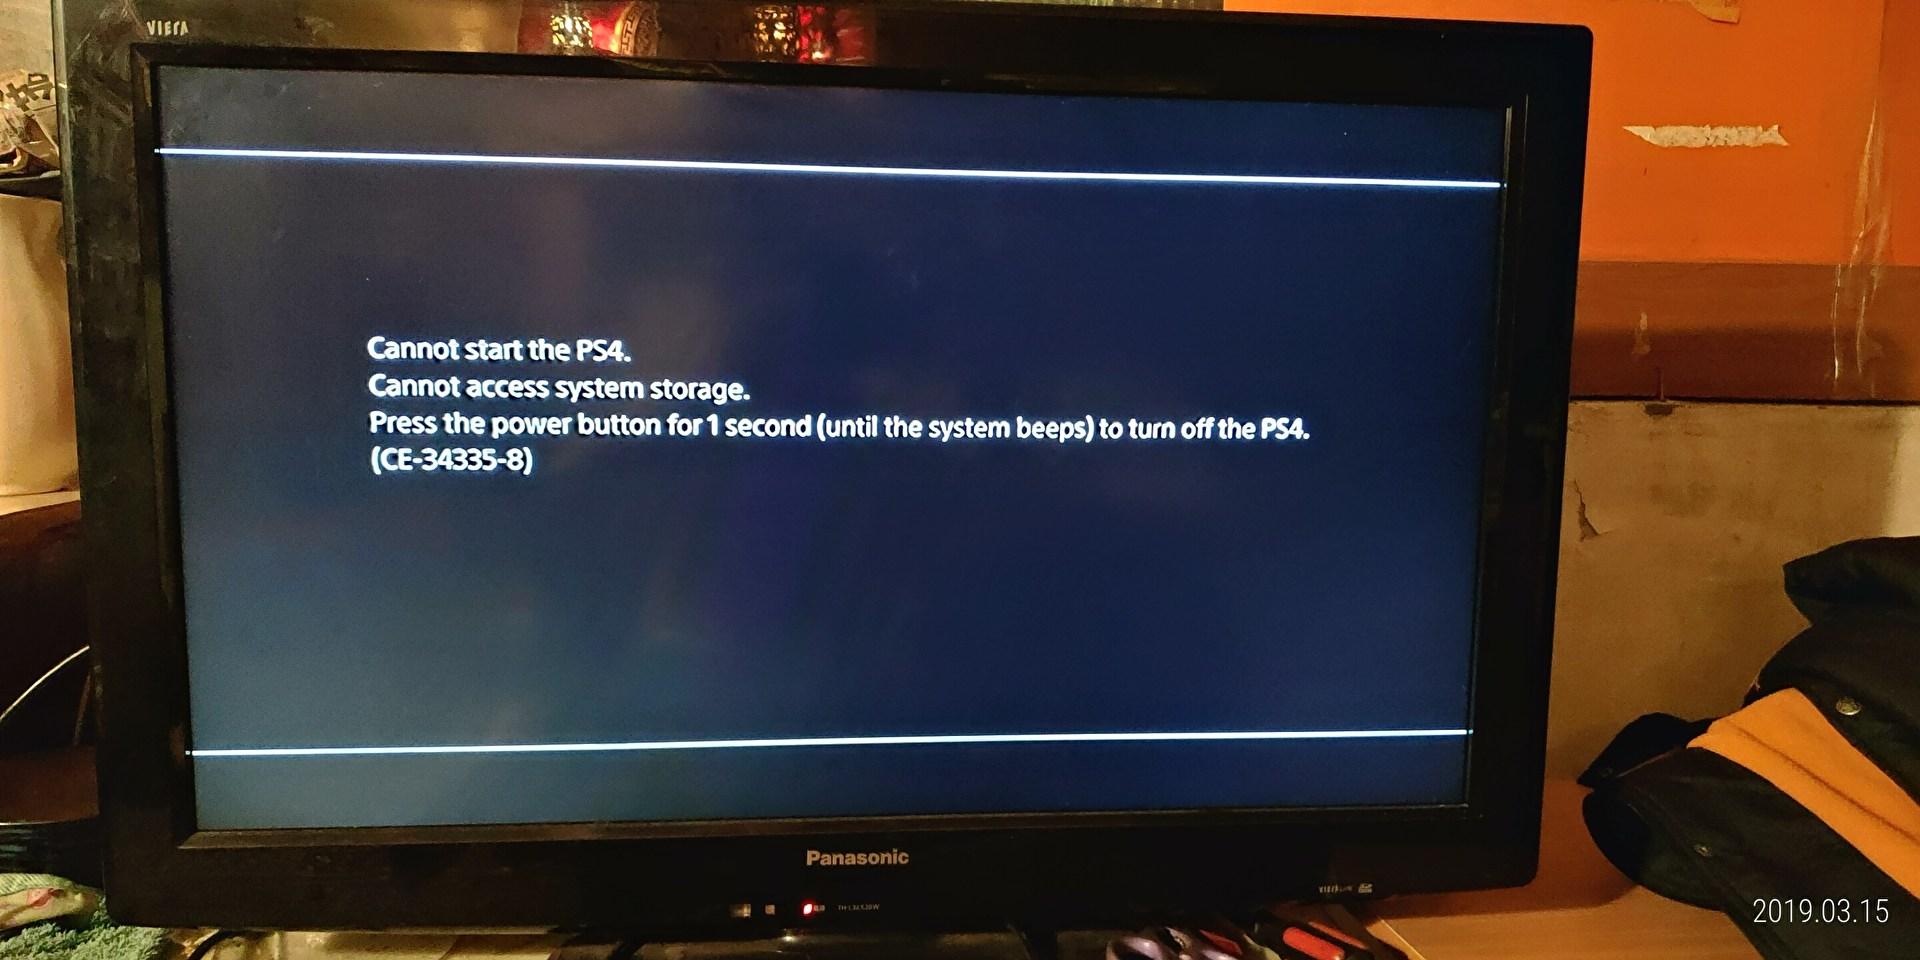 【問題】CE-34335-8 求解 @PS4 / PlayStation4 哈啦板 - 巴哈姆特